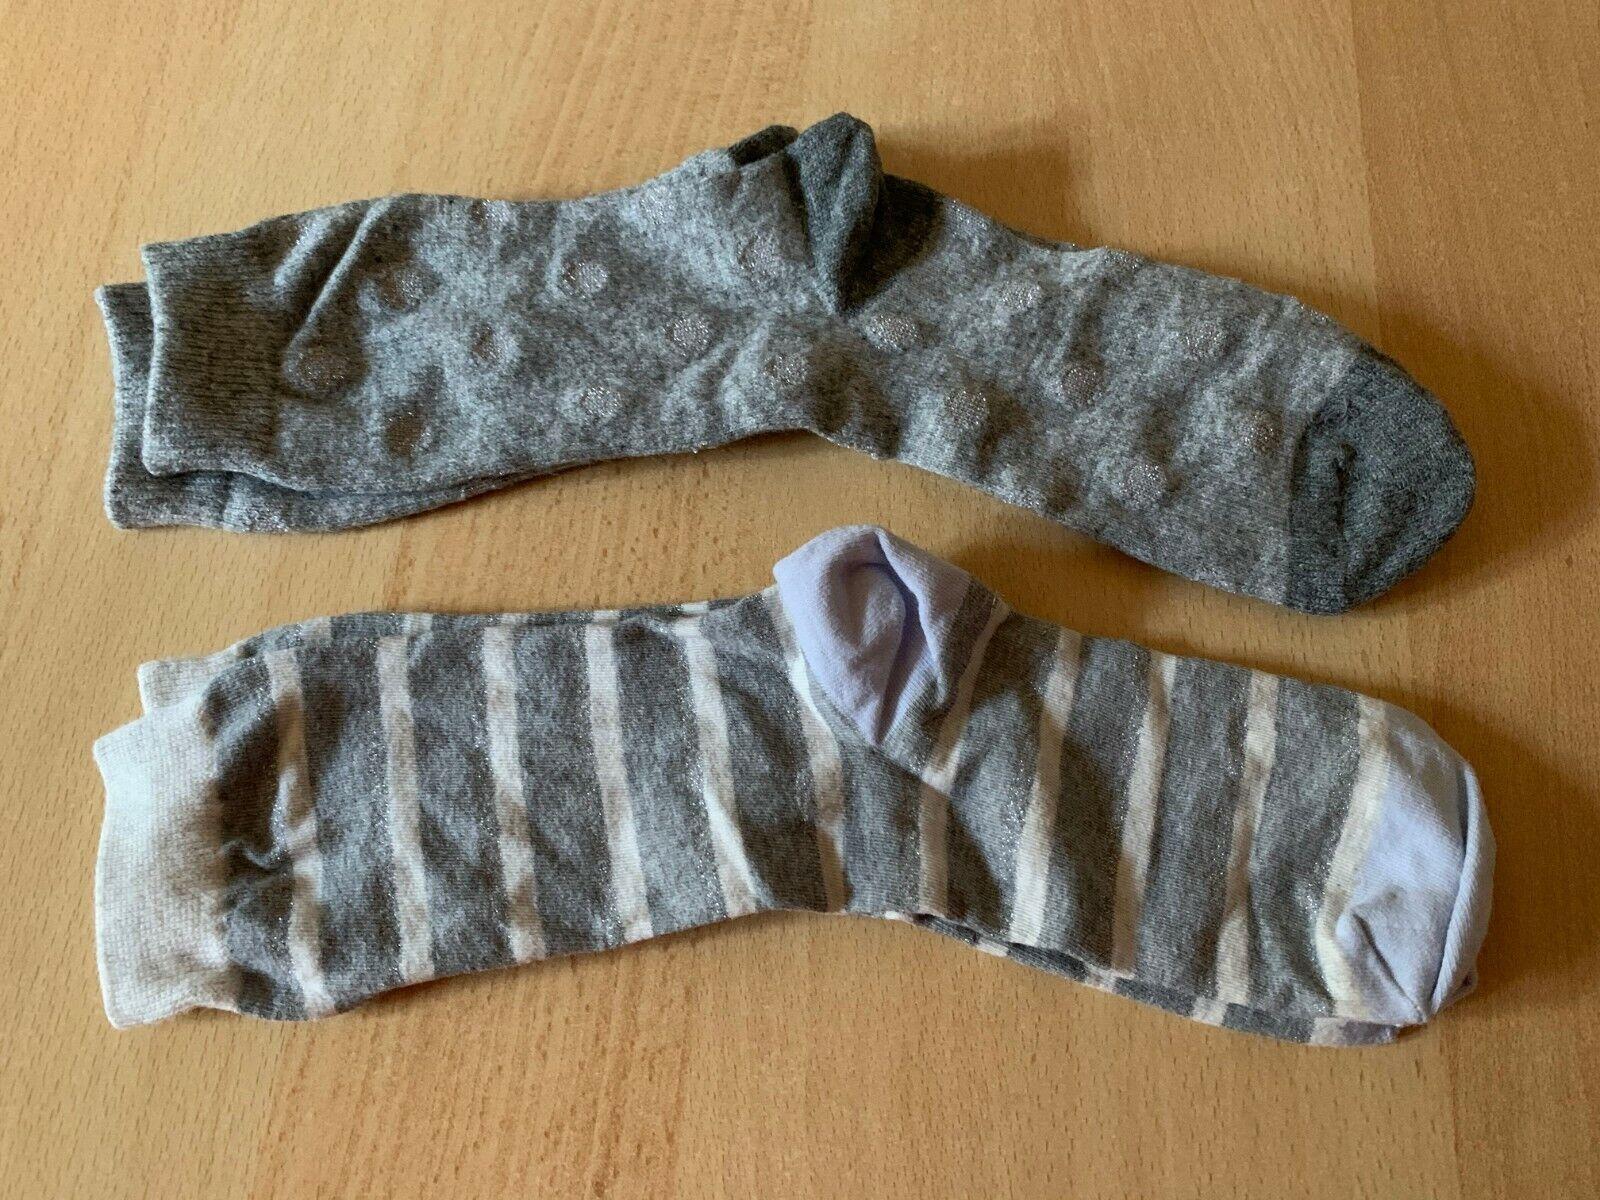 2 Paar GAP Damen-Socken, Gr. 38/39 - neu